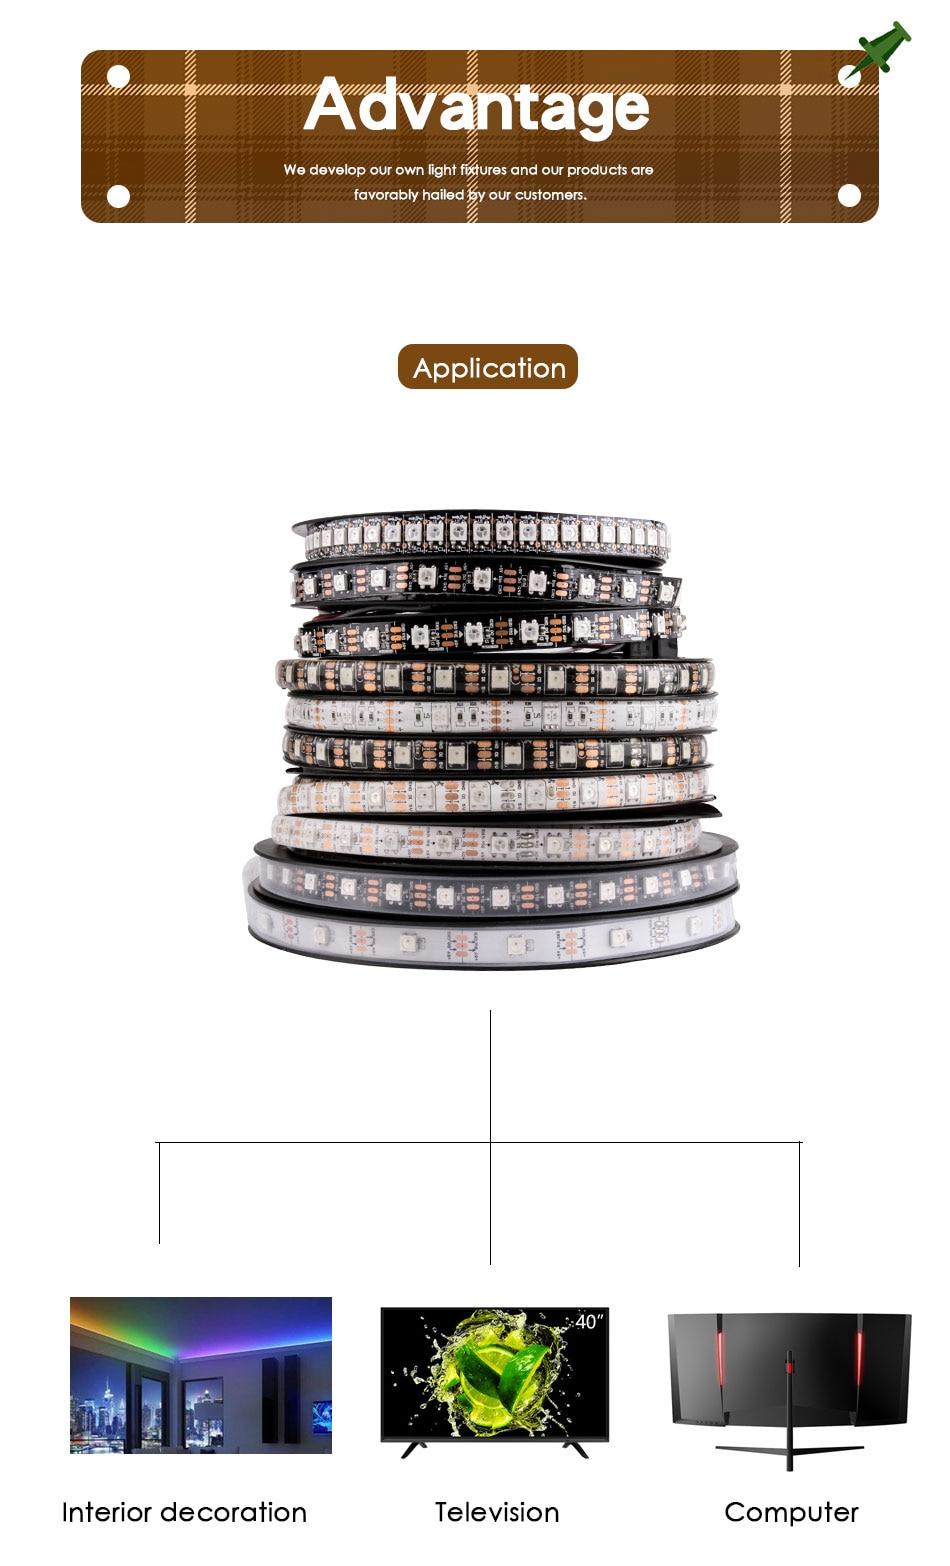 WS2812B LED Strip DC 5V Black White PCB Smart Addressable Pixel WS2812 IC 30/60/144 LEDs 17Key Bar RGB 50CM 1M 2M 3M 4M 5M